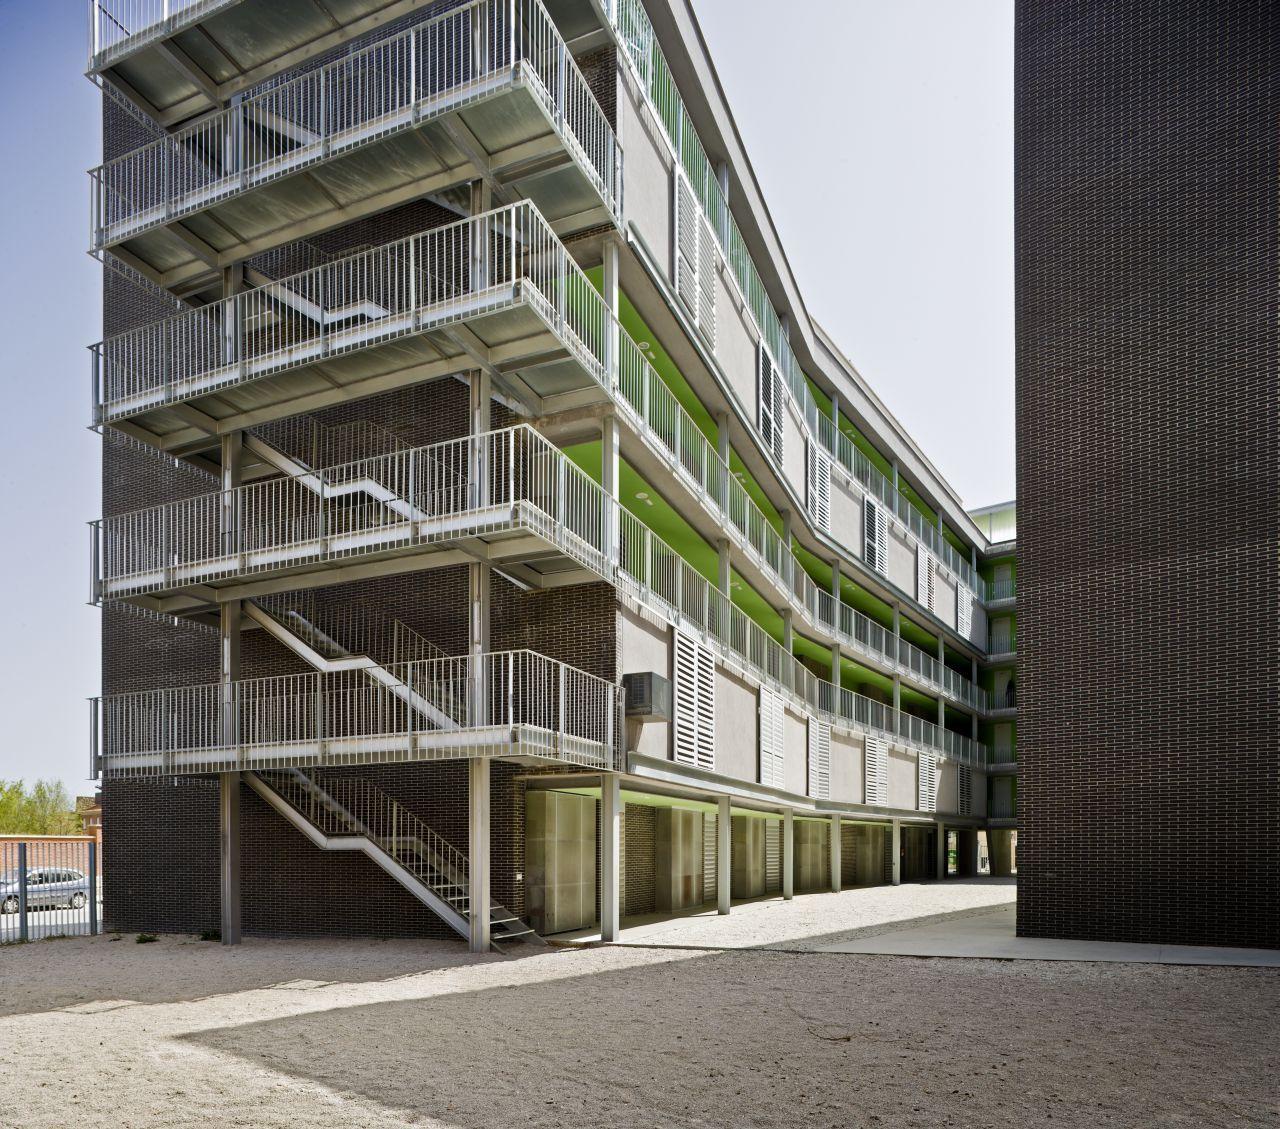 Al4 56 habita es sociais vpo burgos garrido arquitectos archdaily brasil - Arquitectos albacete ...